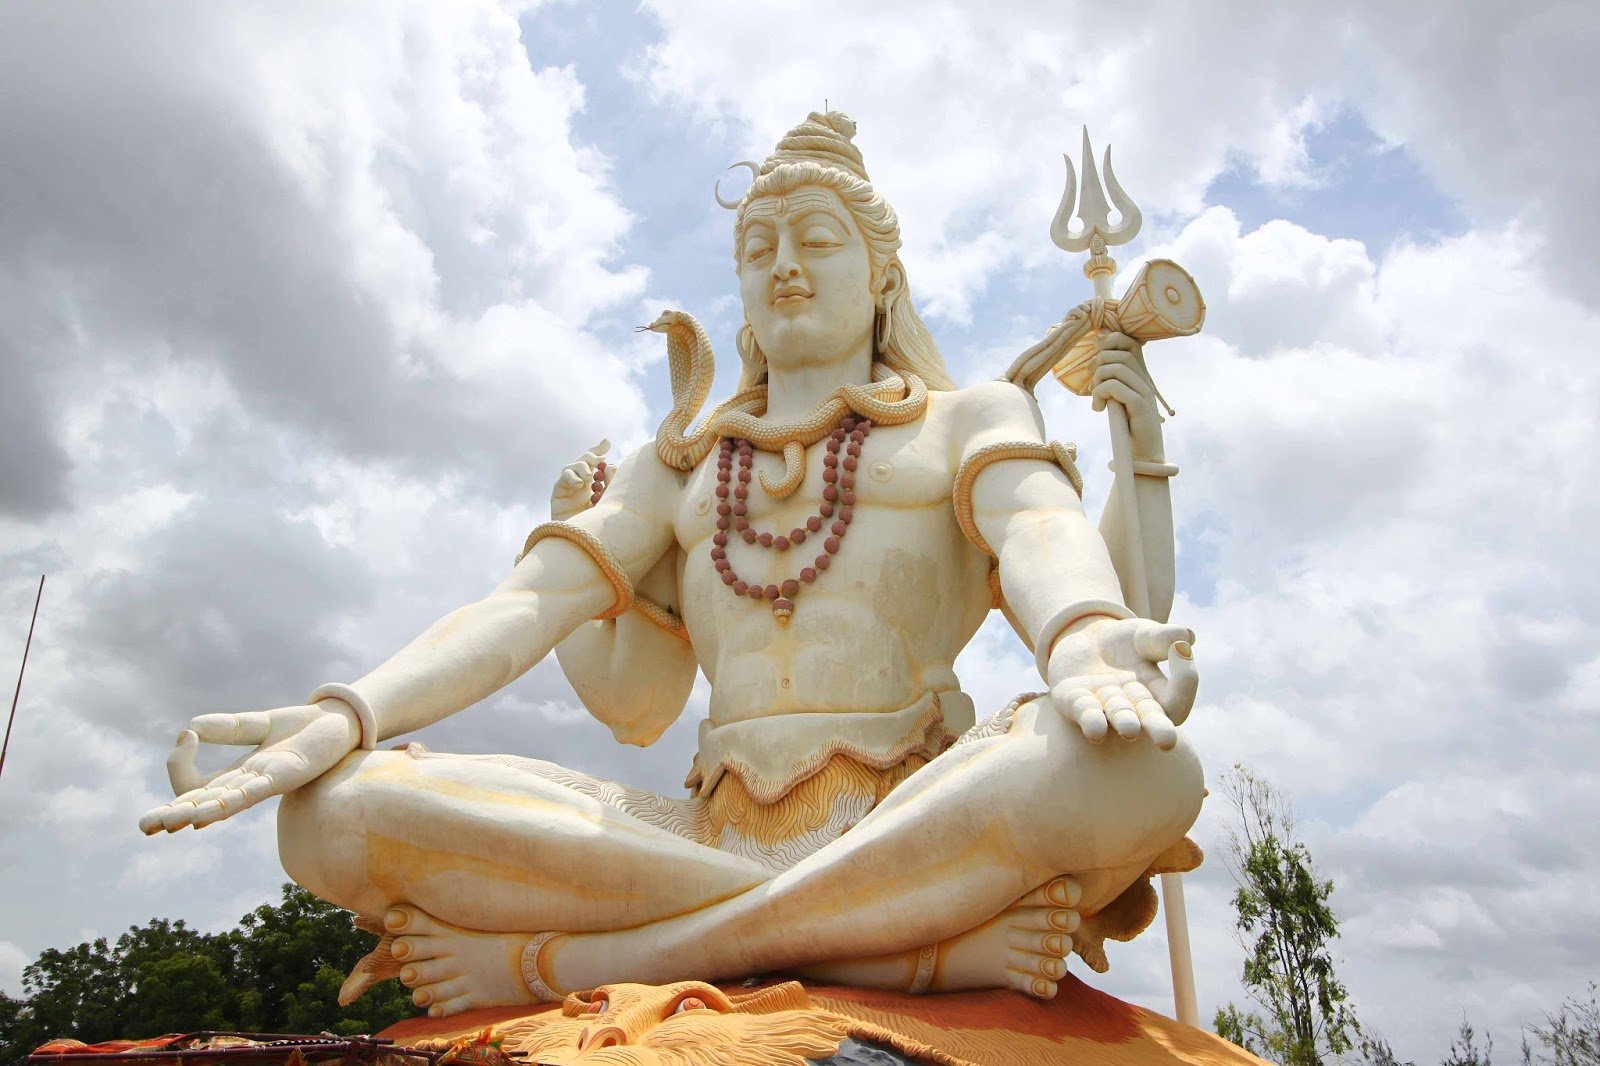 prai hindu singles 9780143099703 0143099701 myth = mithya - a handbook of hindu mythology, devdutt pattanaik  9781871407181 1871407184 encyclopedia of british singles - 1960,.